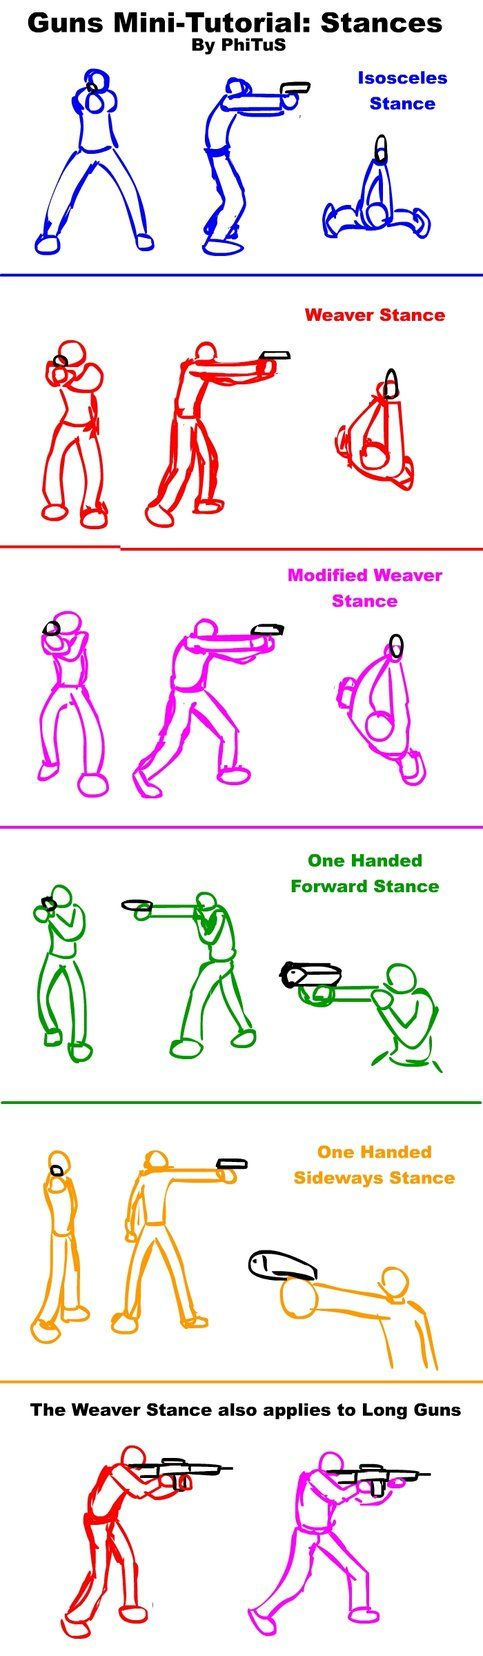 Guns Mini-Tutorial: Stances by ~PhiTuS on deviantART